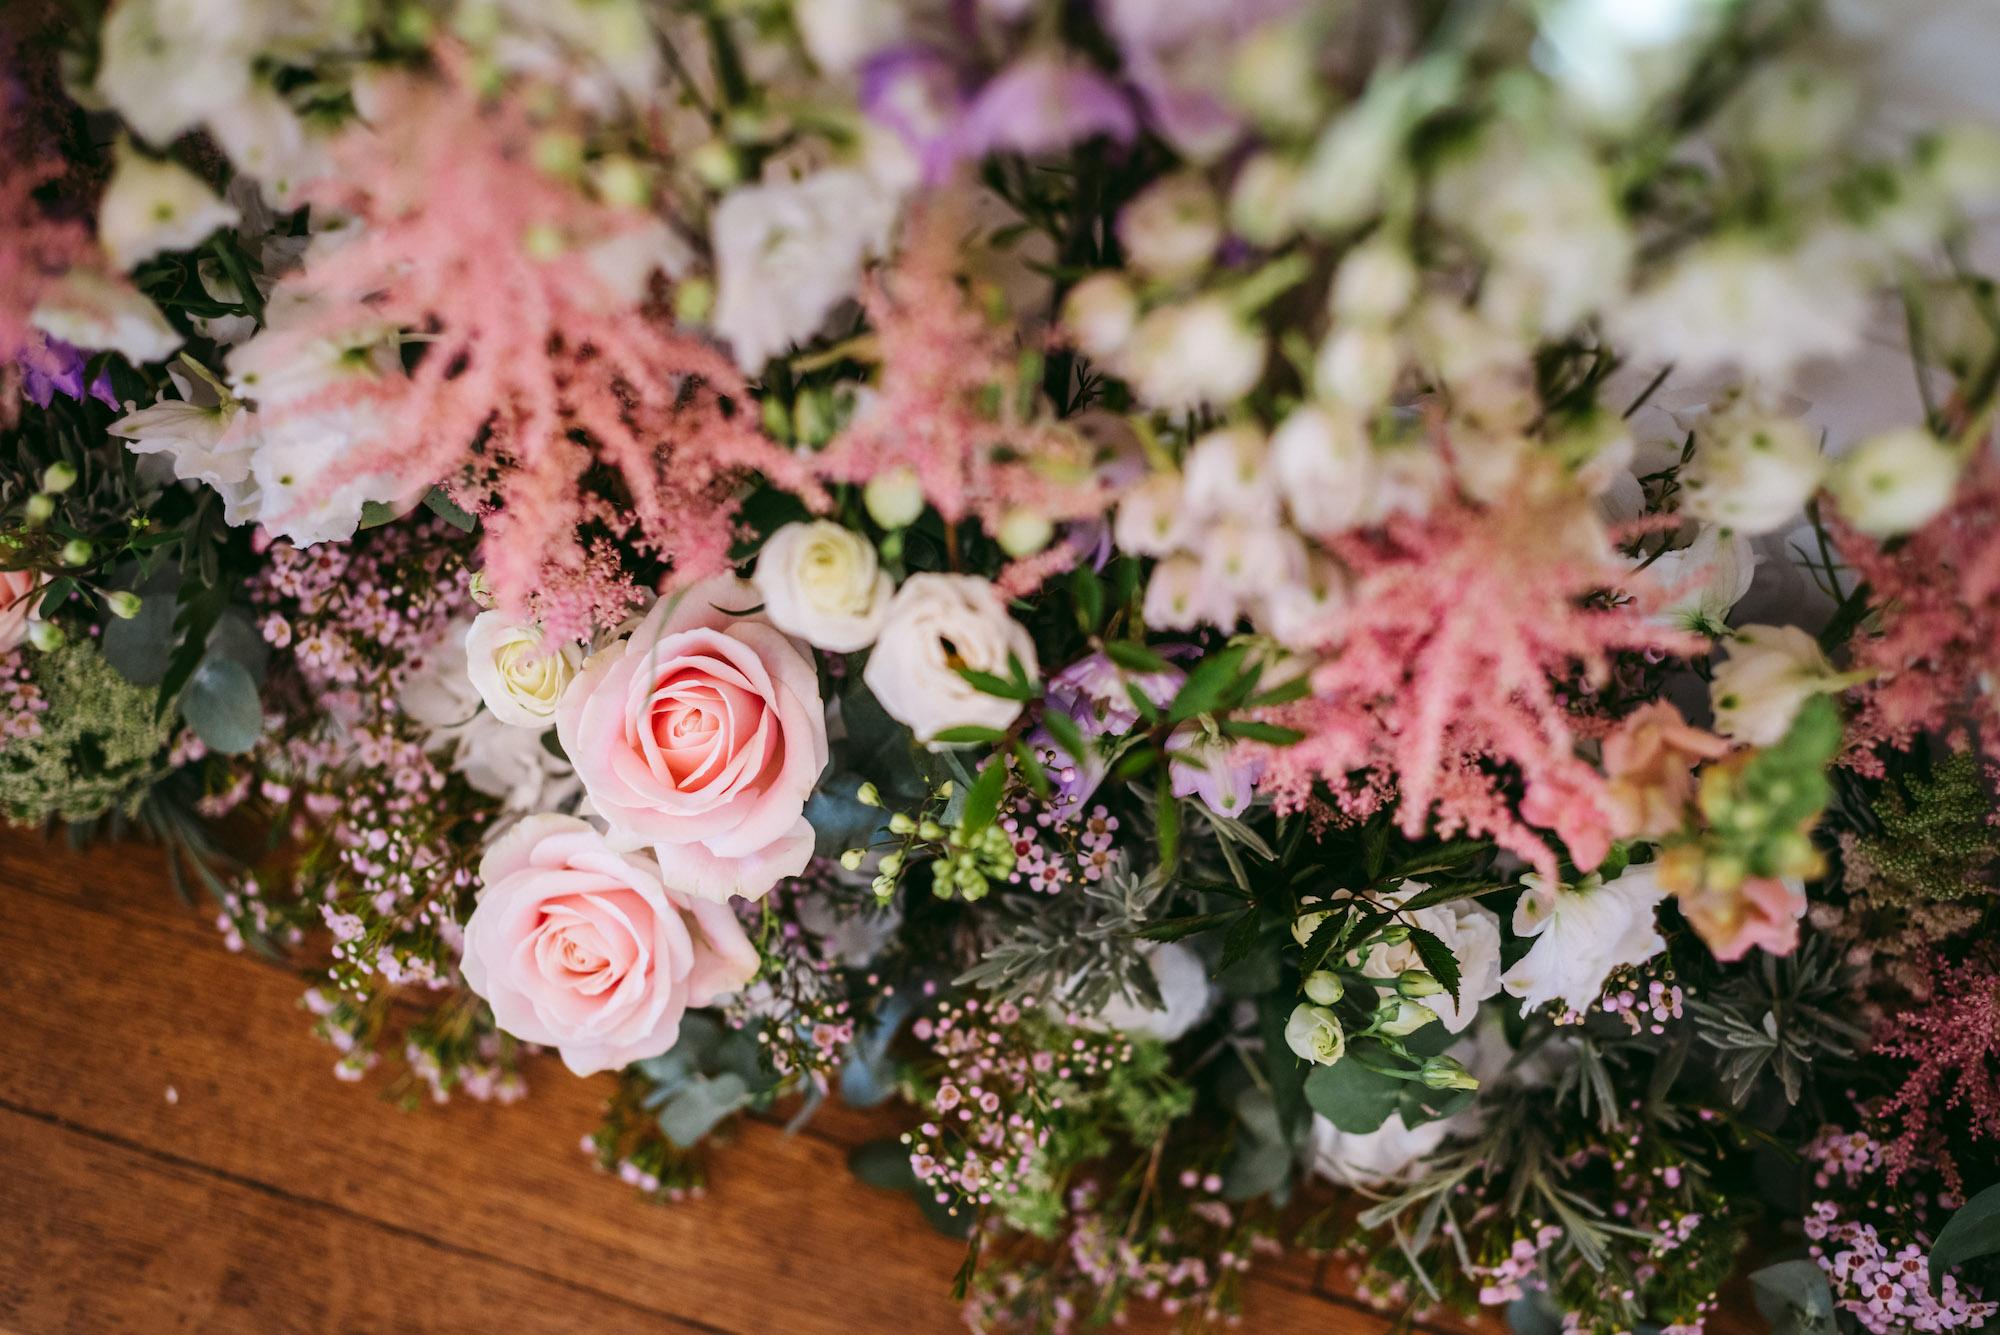 66c   Hengrave Hall Wedding   Suffolk Wedding   Lamare London   Luxury Wedding Planner   Jon Mold Photography.jpg